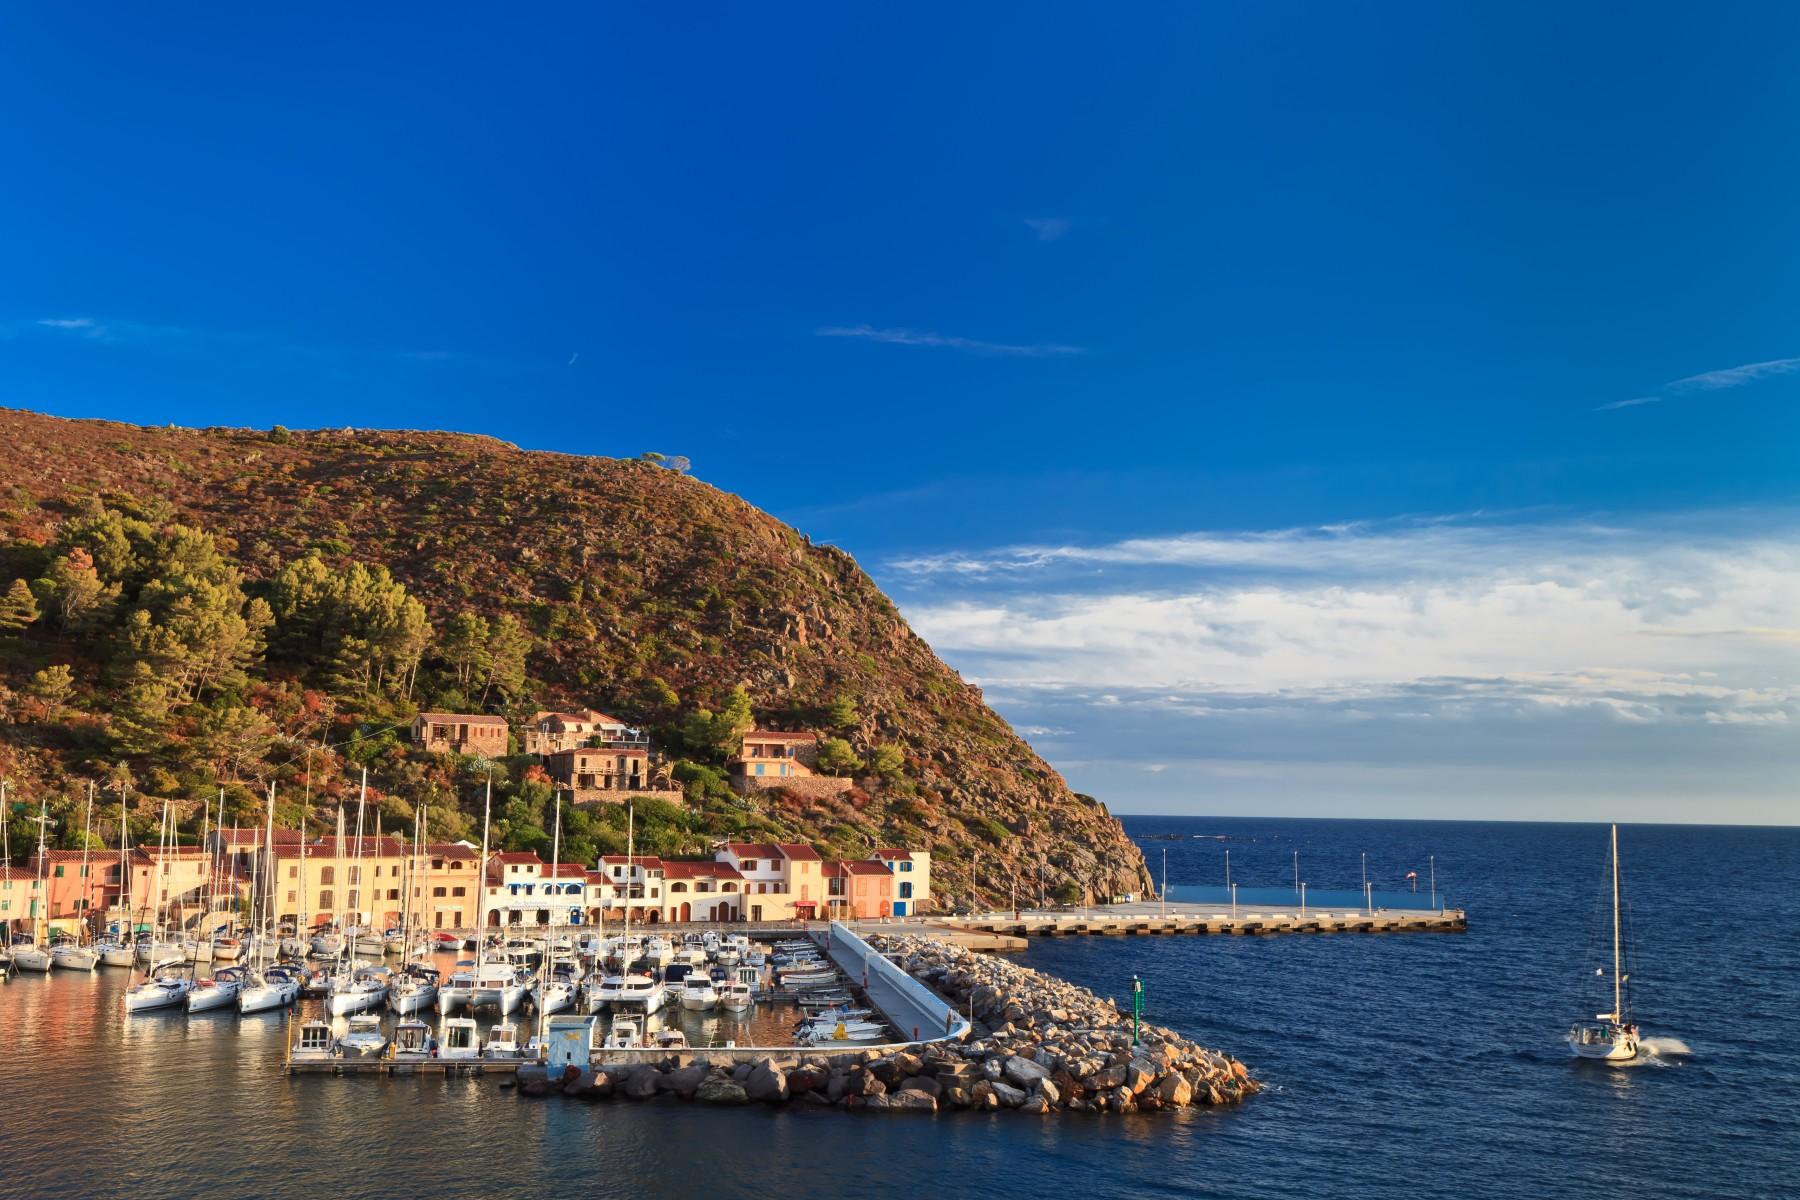 Isola di Capraia, Italy